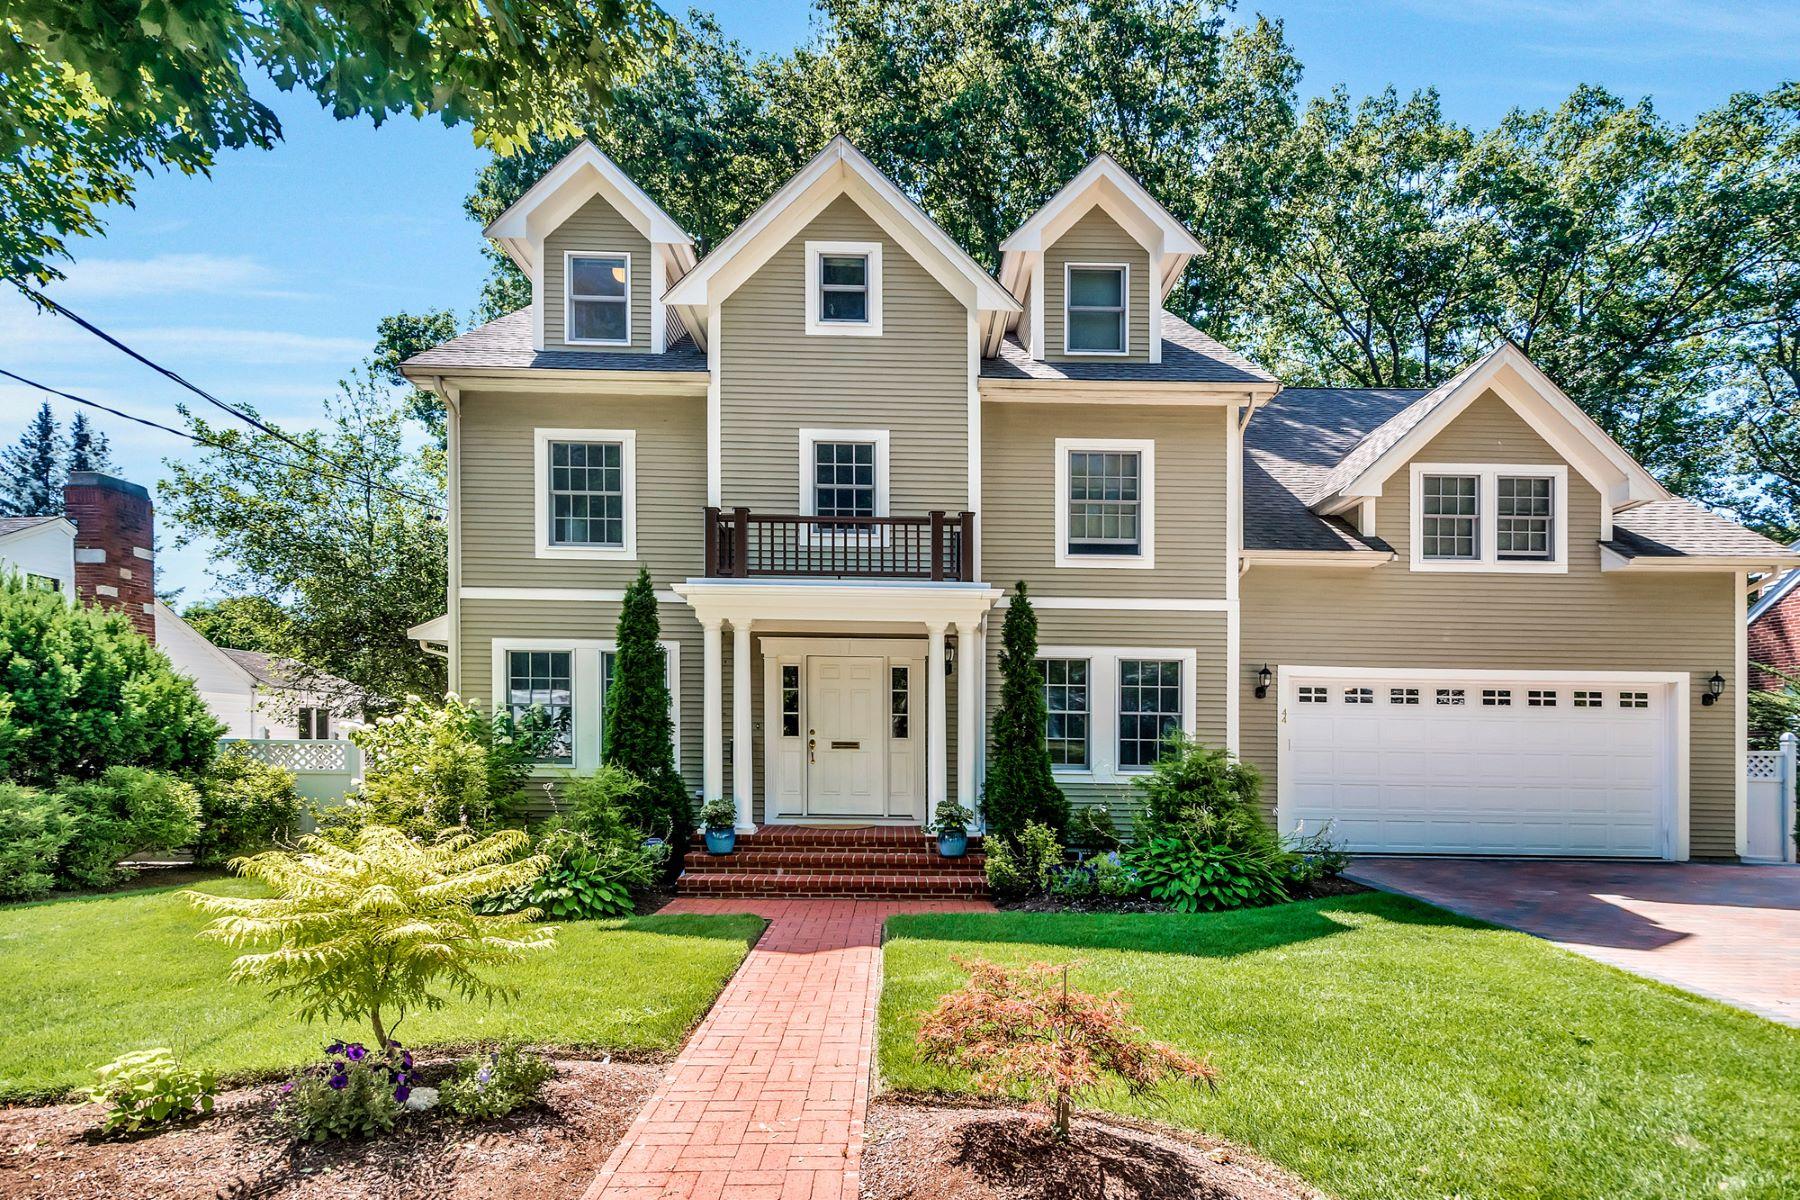 Single Family Home for Sale at 44 Parker Avenue, Newton Newton, Massachusetts 02459 United States